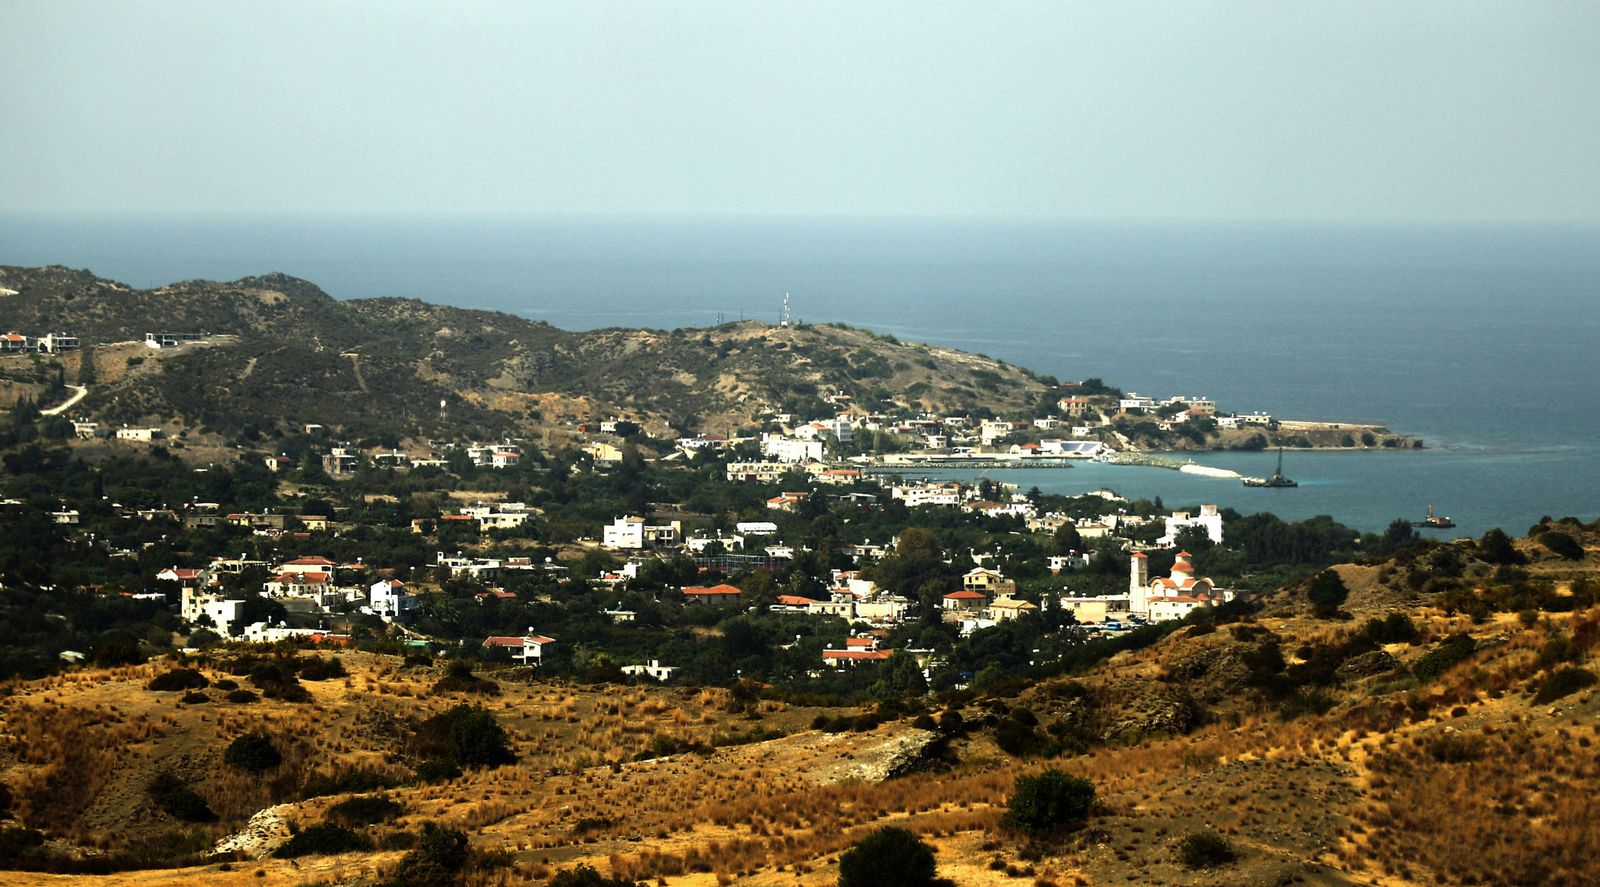 FILES-CYPRUS-UN-PEACE-TRAVEL